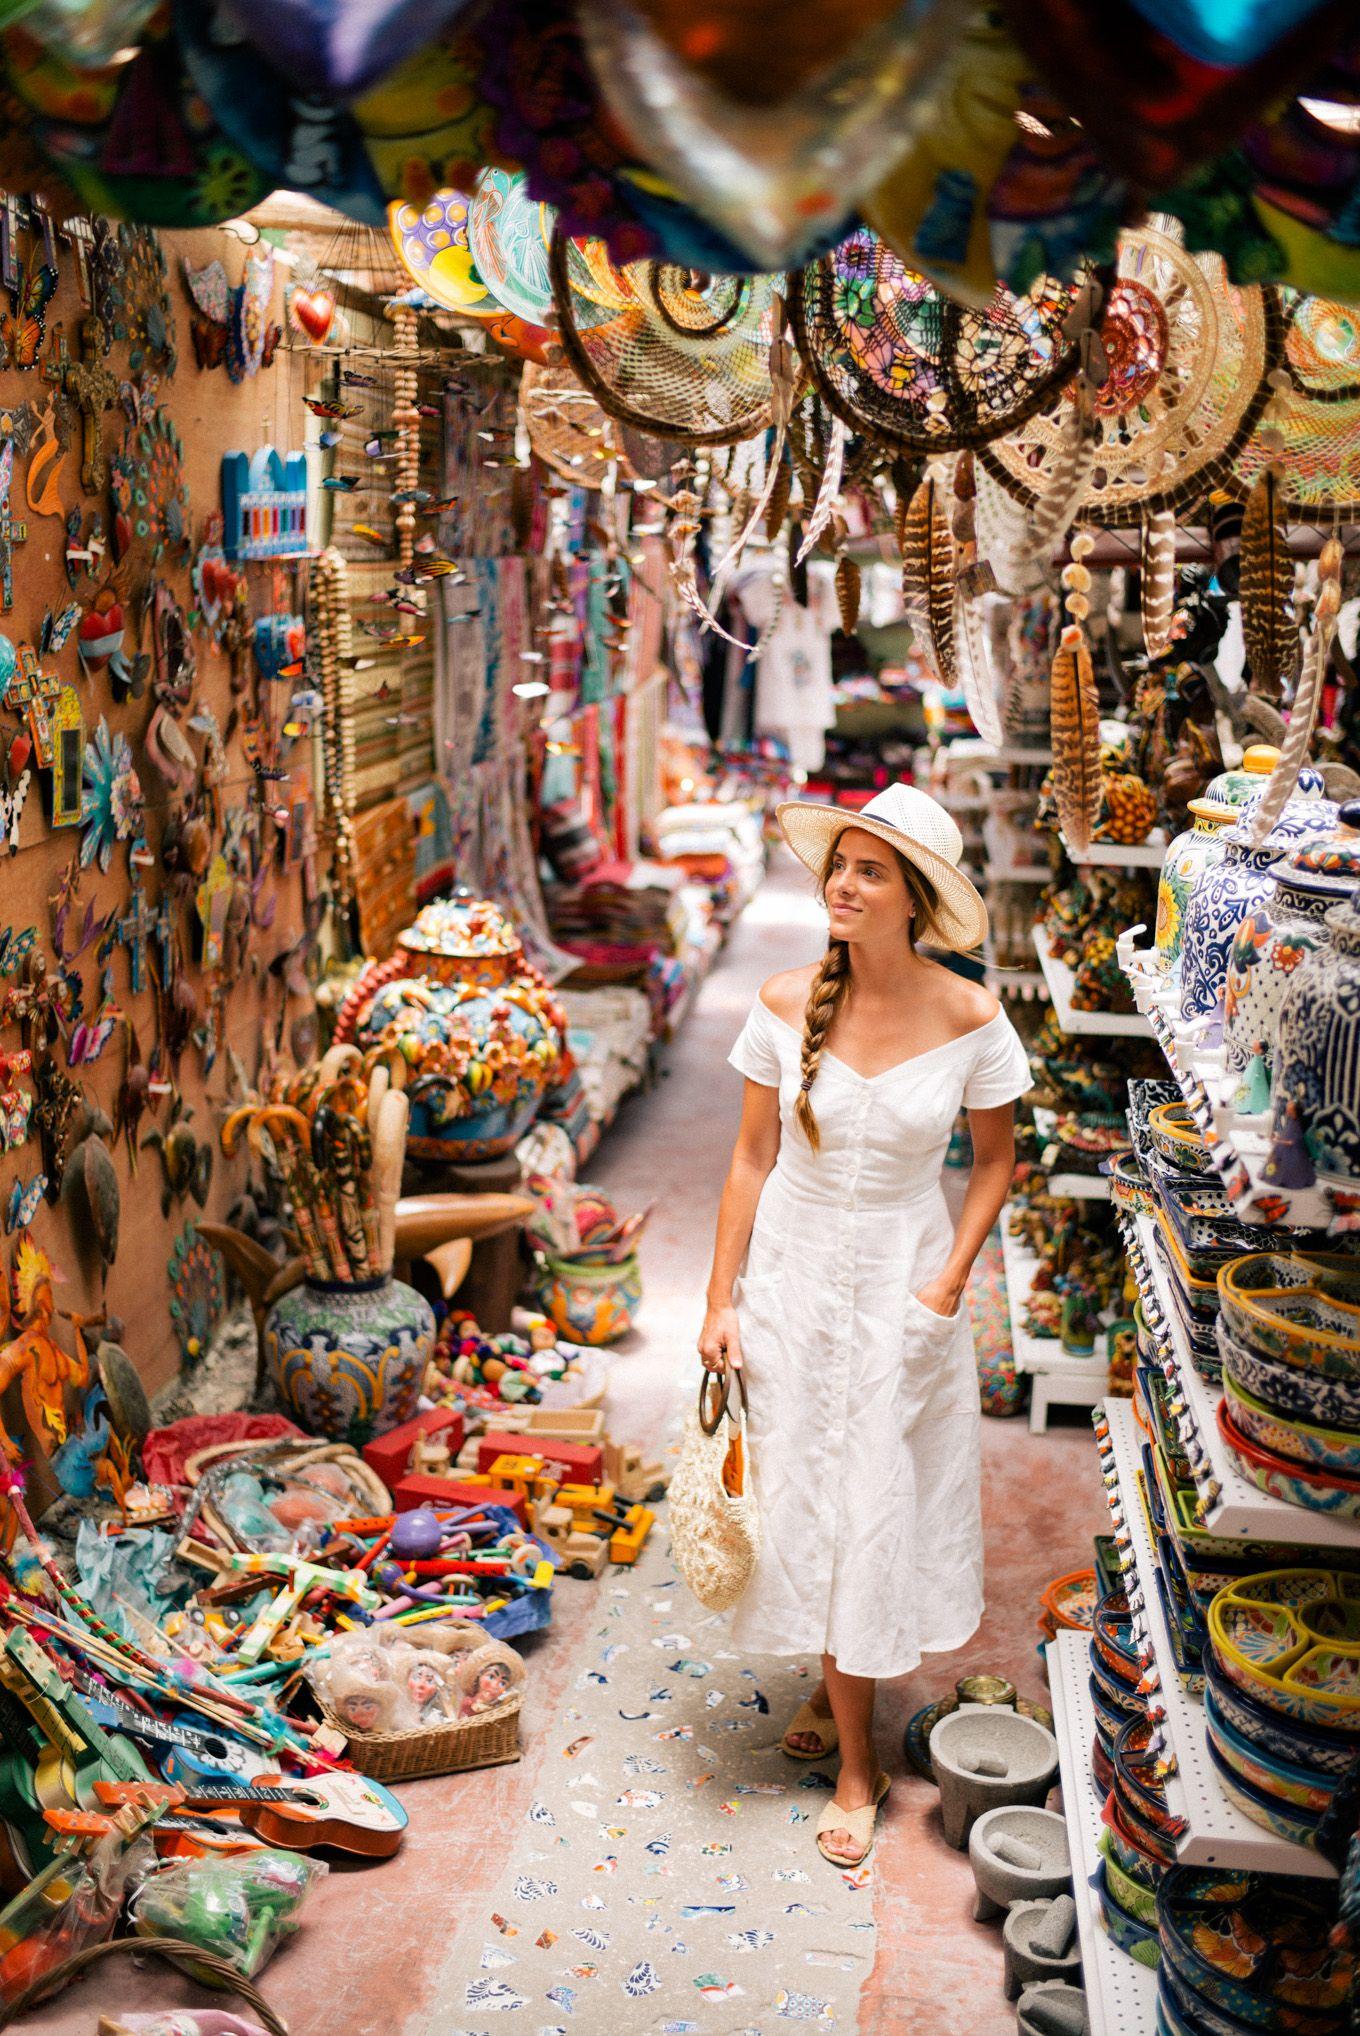 Shopping In In TulumTravel Mexico TravelMexico Shopping n0wOyvmN8P